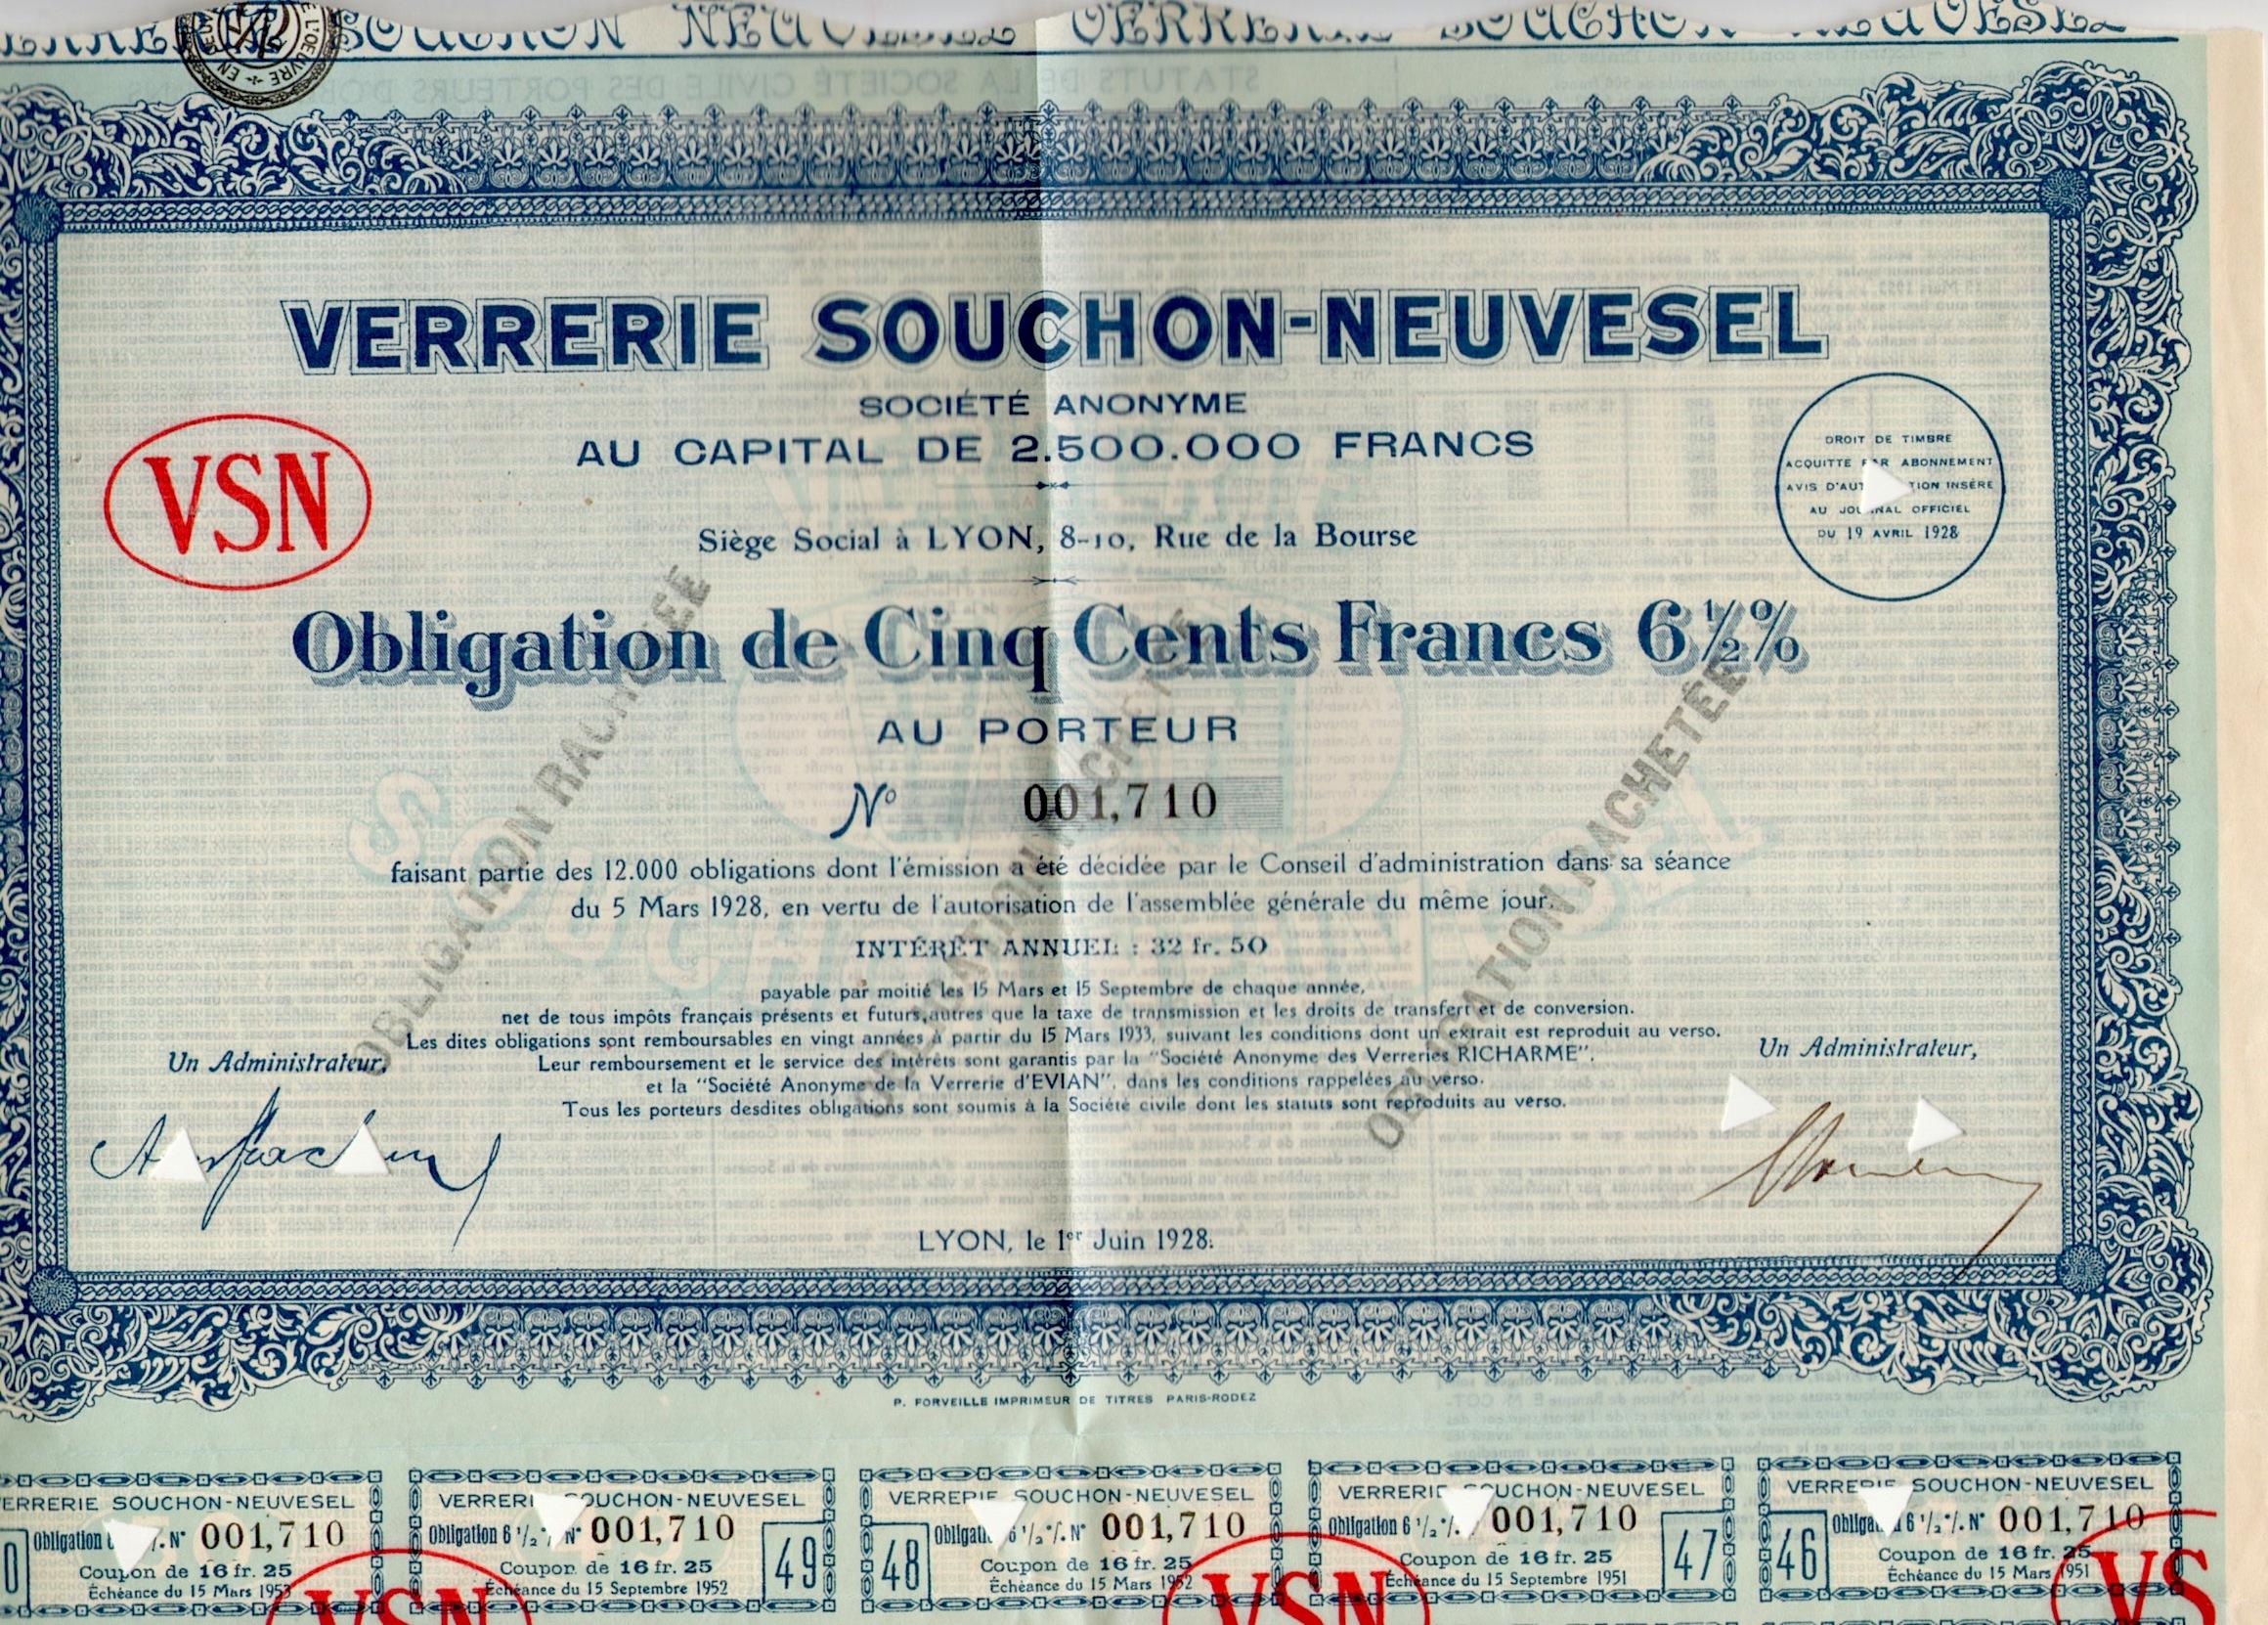 Souchon-Neuvesel.1